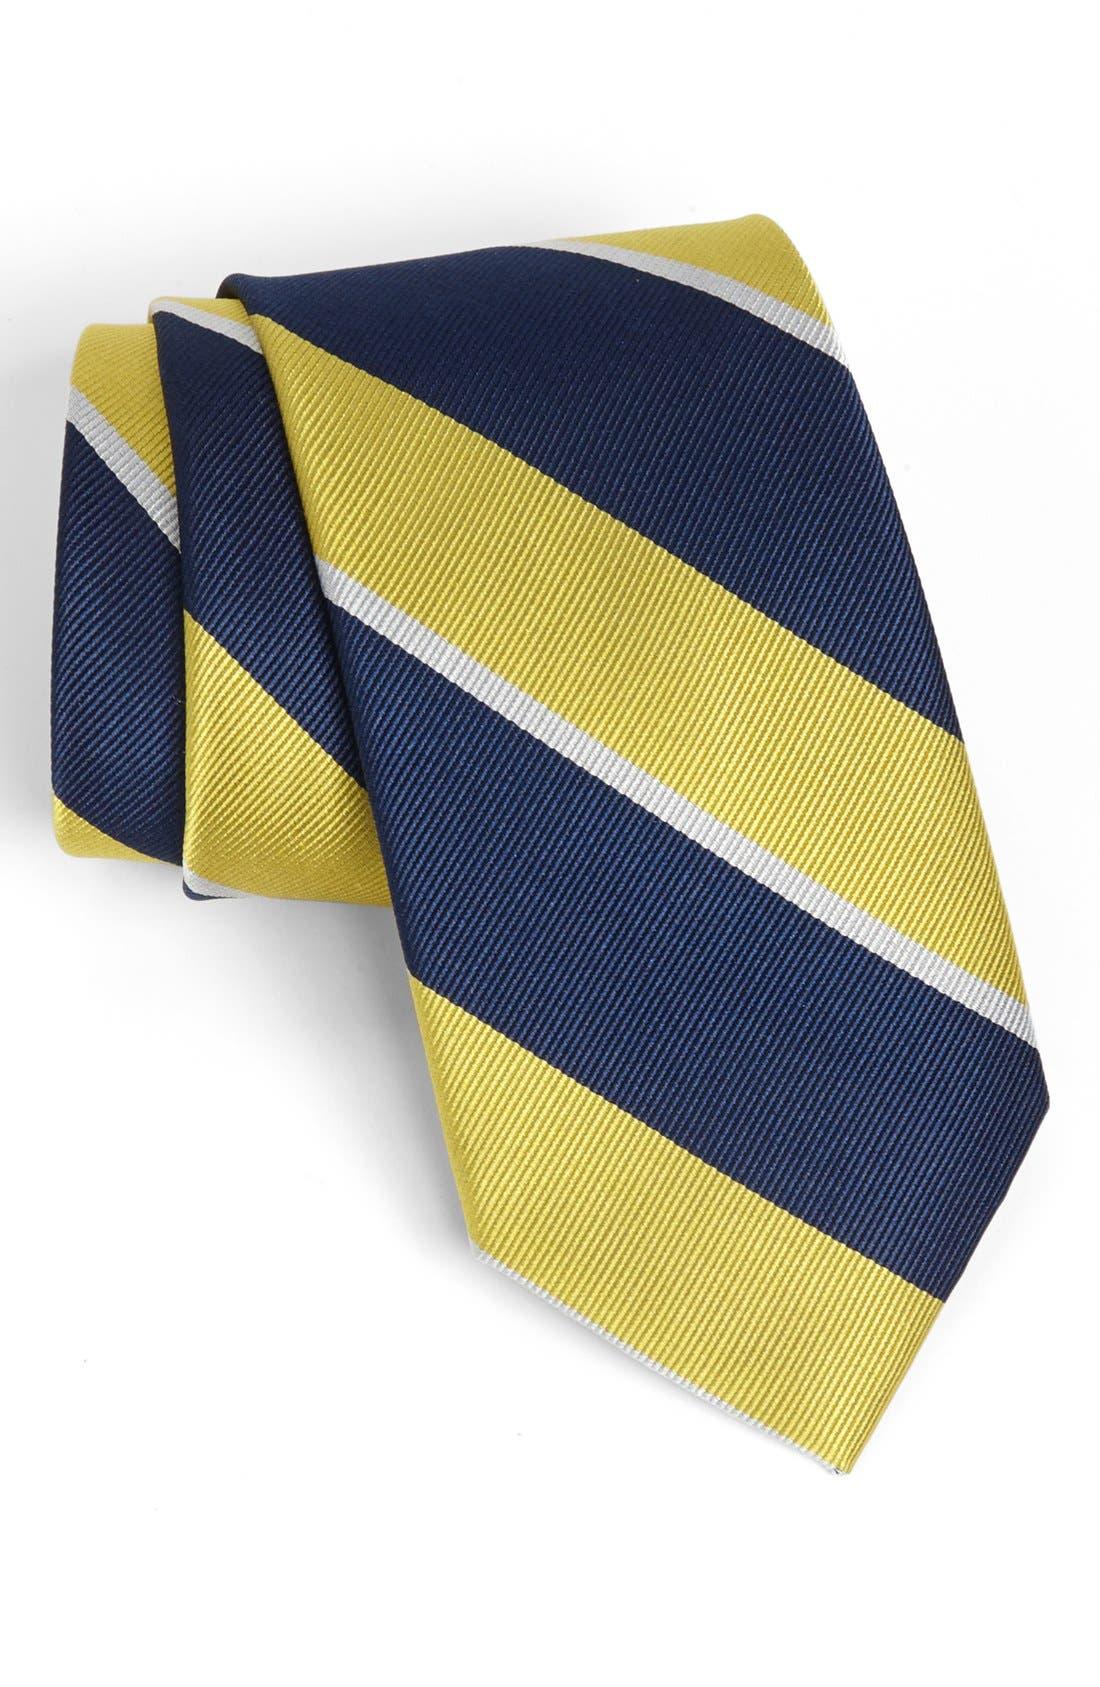 Alternate Image 1 Selected - 1901 'Overlook' Stripe Silk Tie